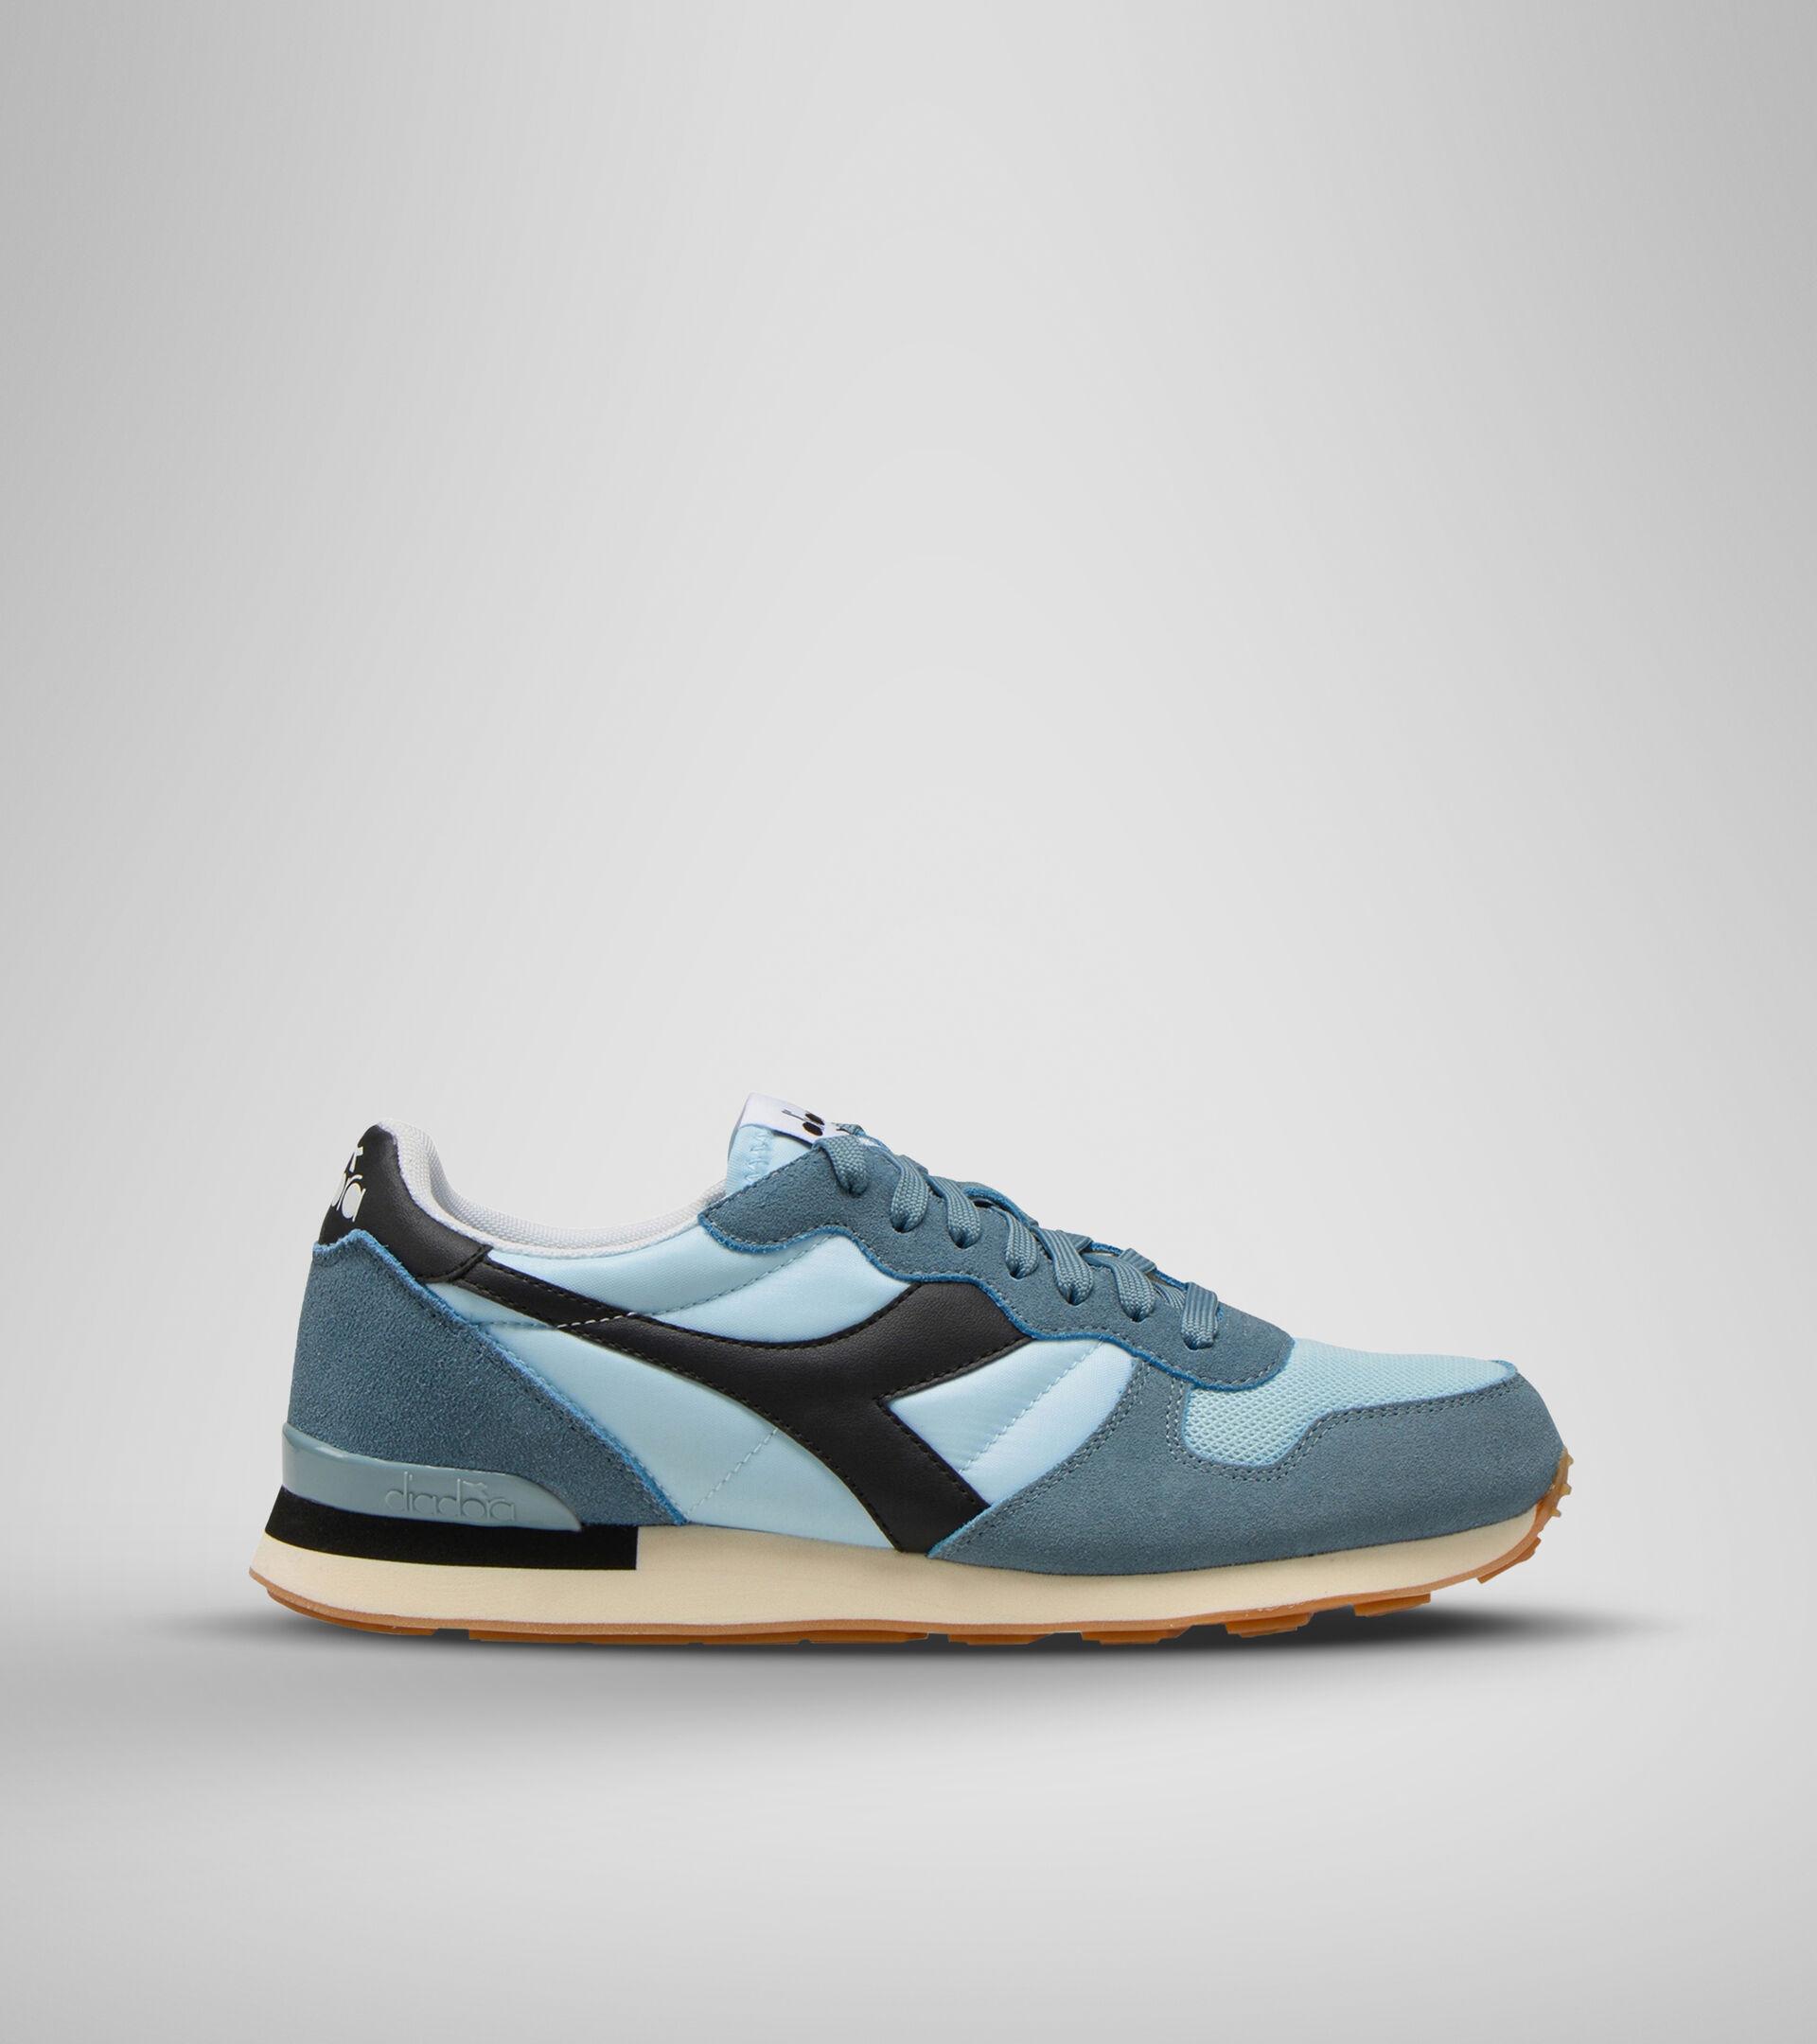 Footwear Sportswear UNISEX CAMARO AZZ AVIO/AZZ STELLARE/NERO Diadora